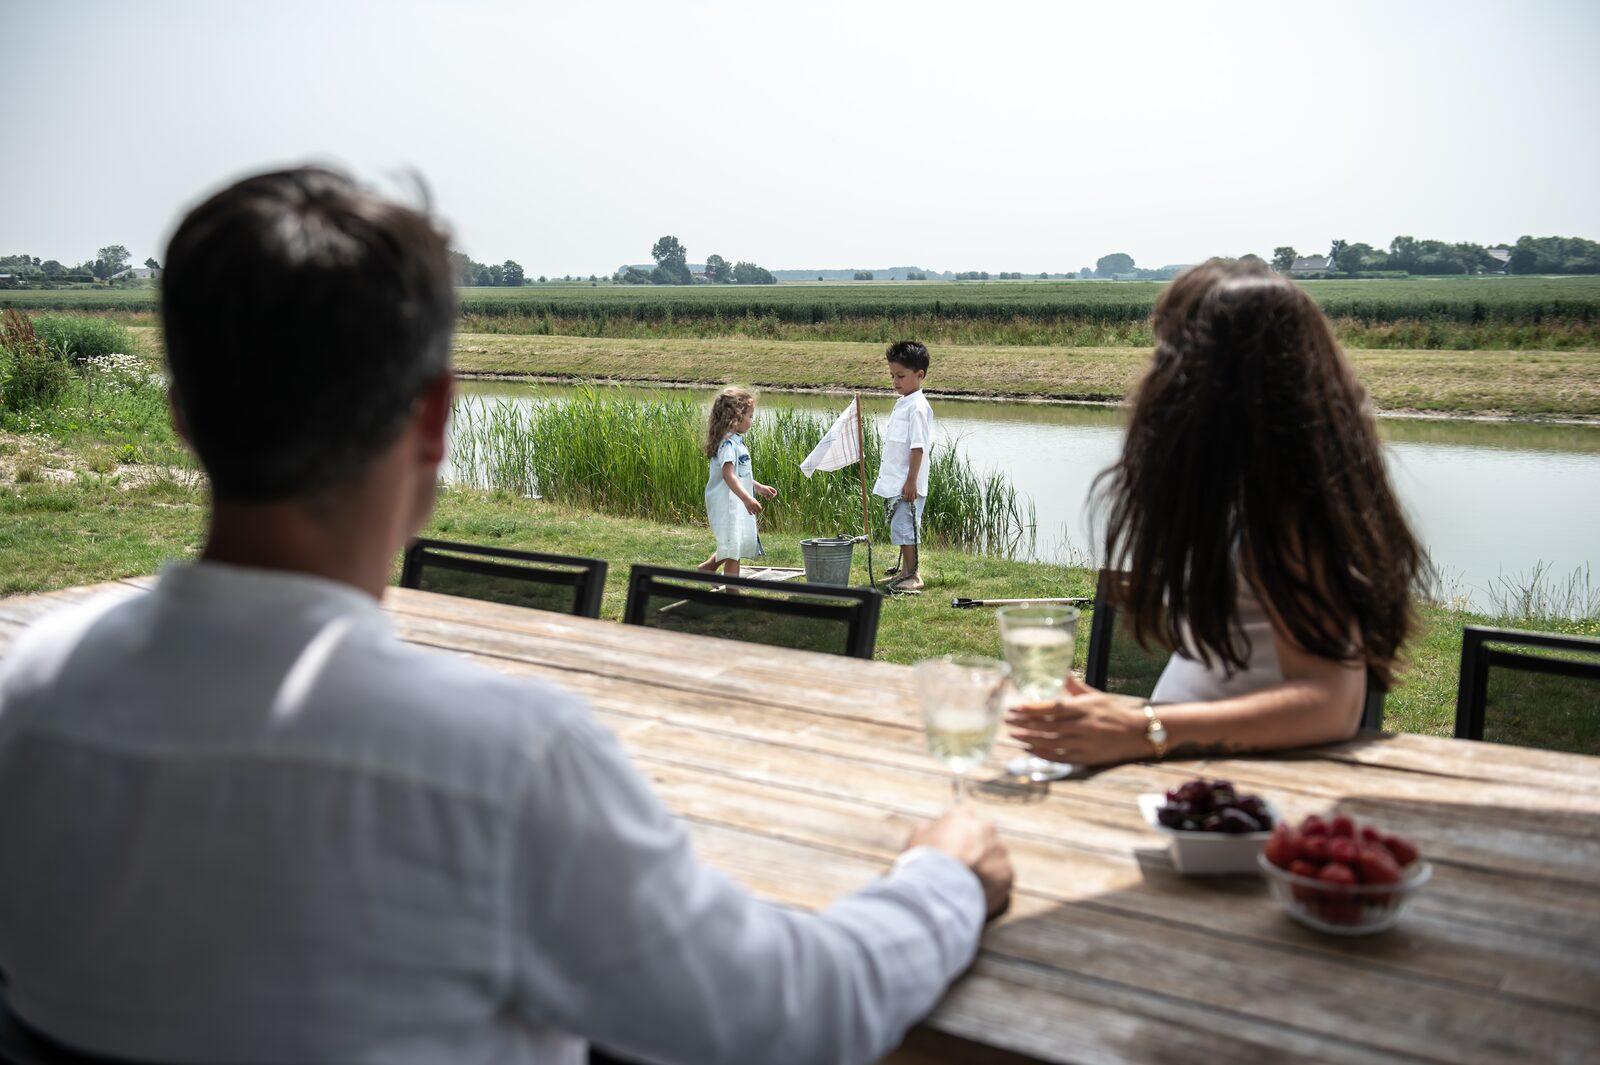 Luxus-Ferienvilla in Zeeland vermieten